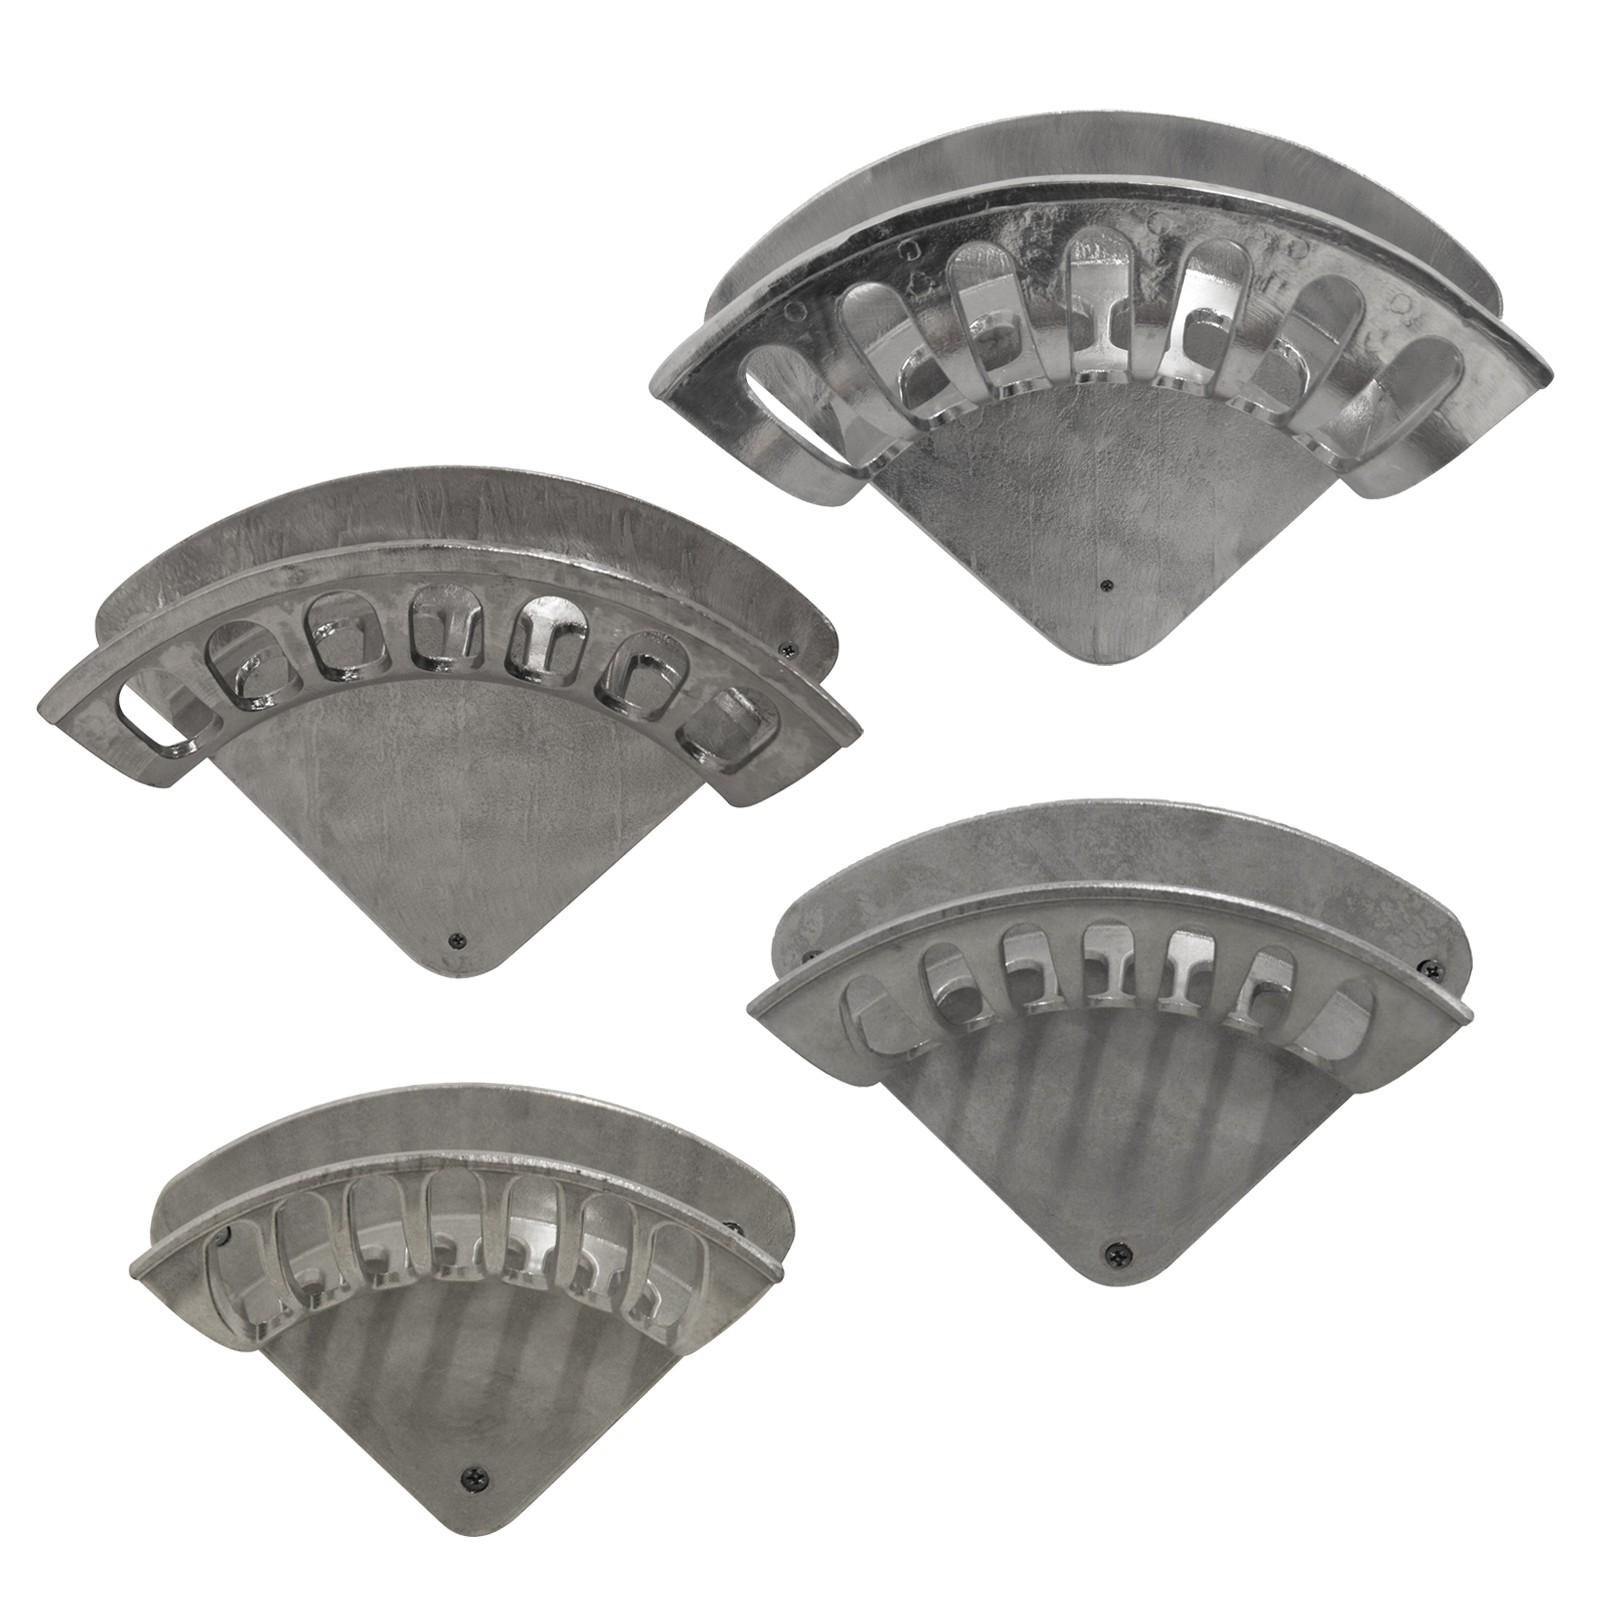 1BB Angelrolle 1000-7000 Serie Gapless Head Spinning Wheel Drau/ßen Lzdingli Angelzubeh/ör Metallarm 13